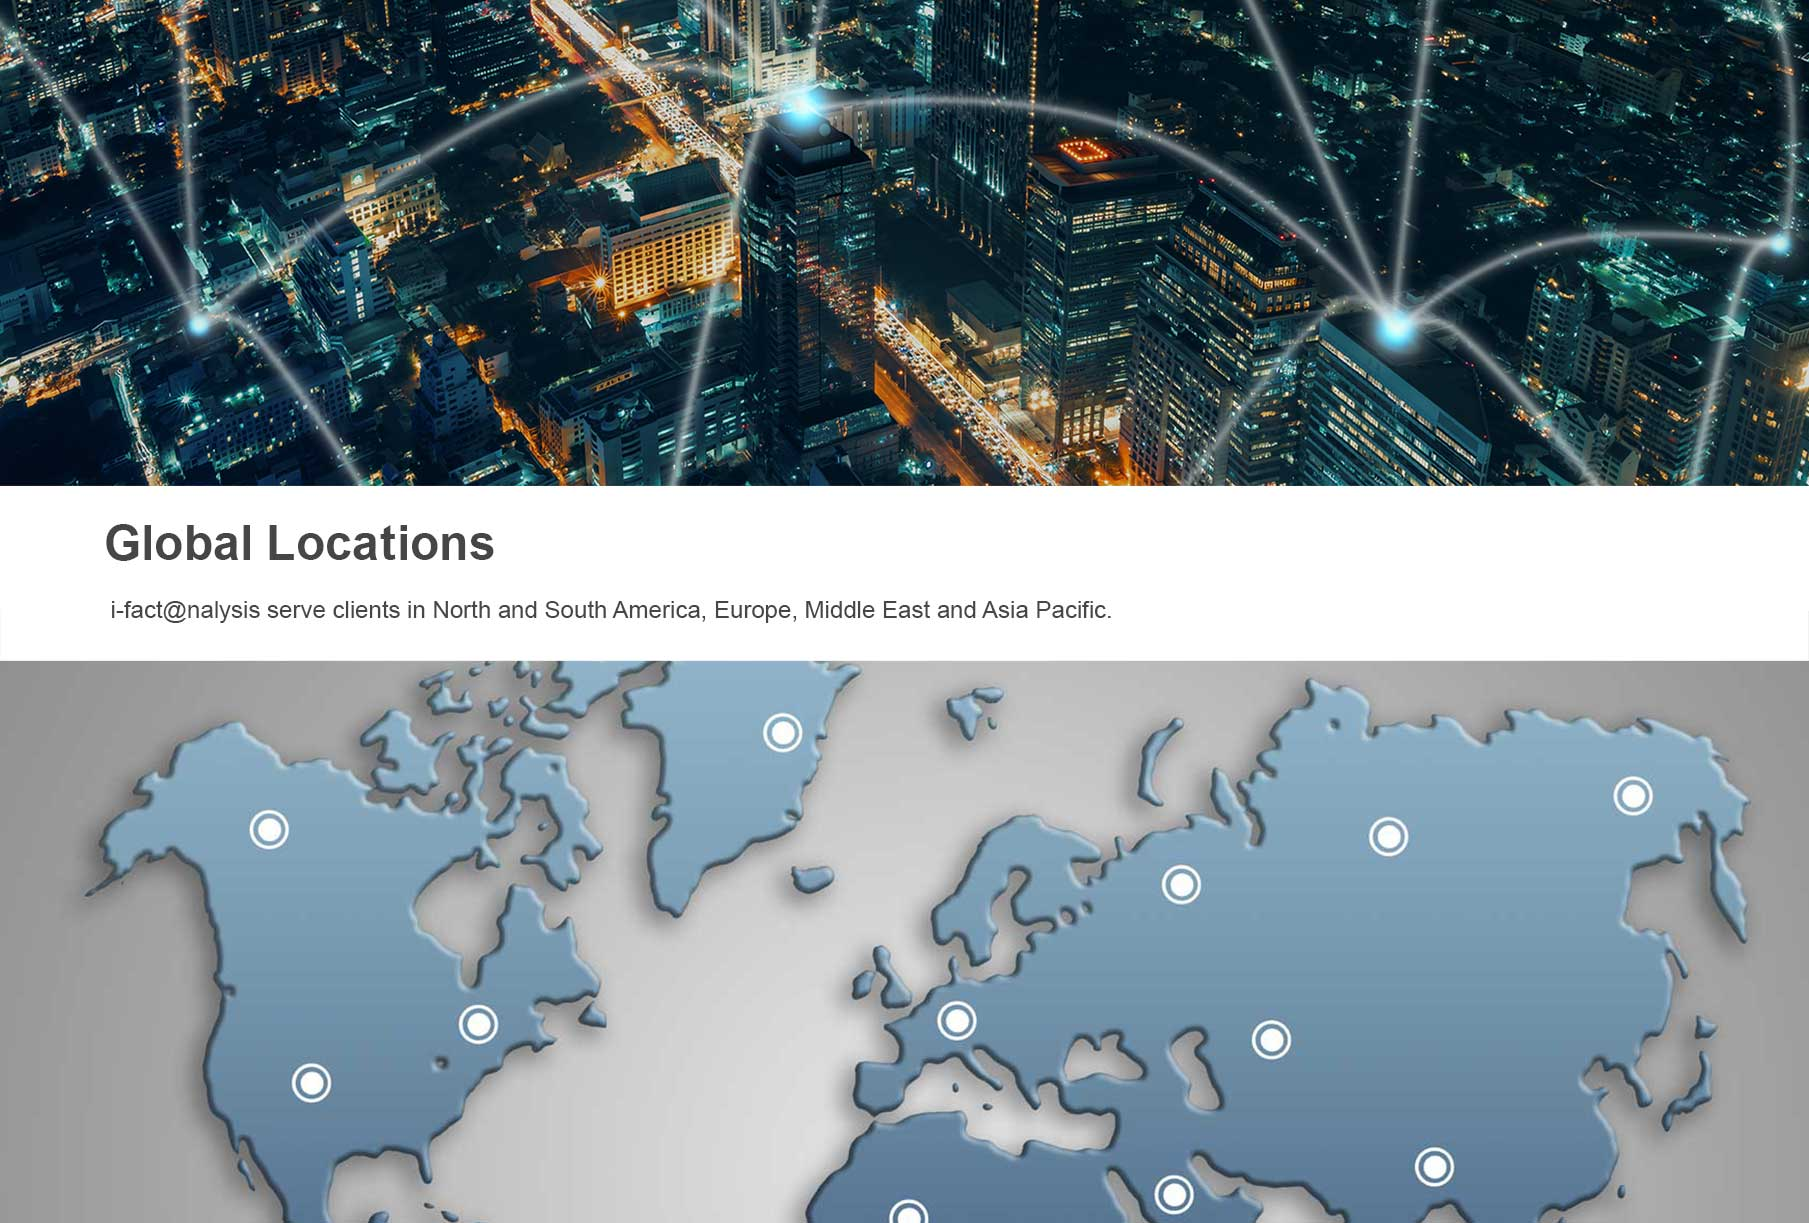 i-factanalysis locations